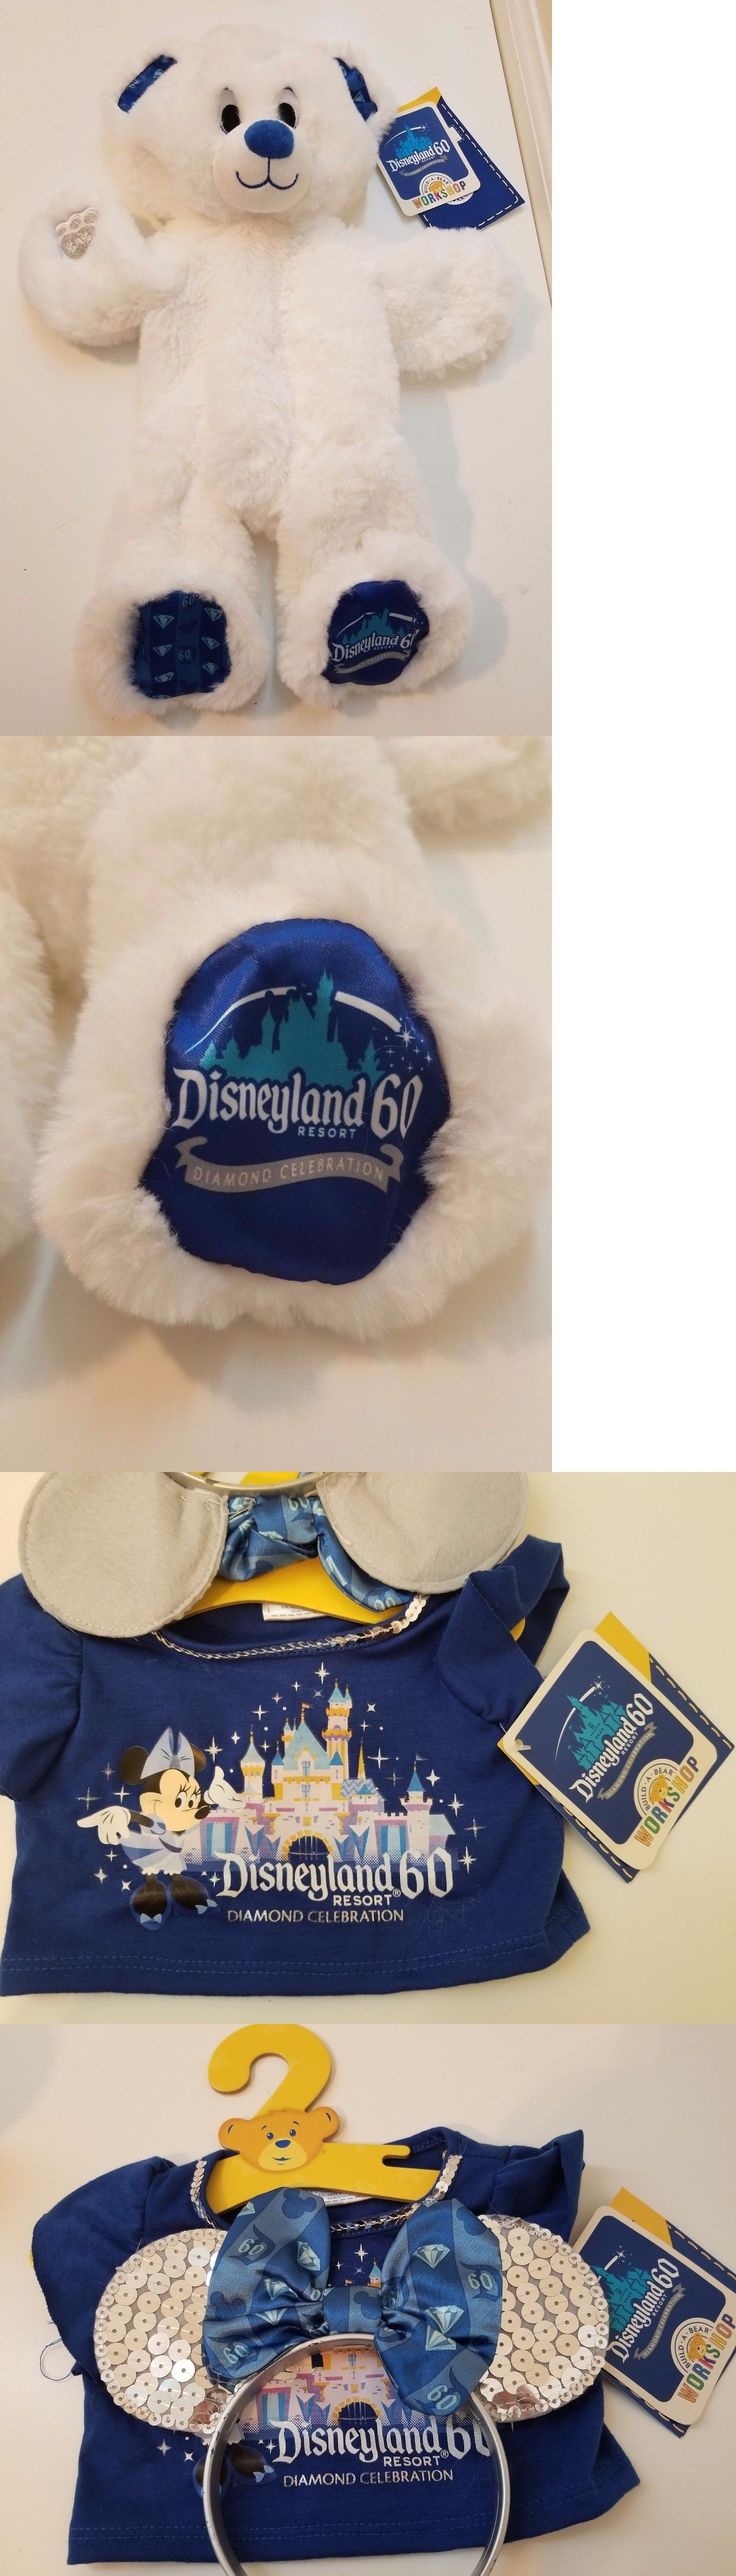 Disney 2597: Build A Bear Disneyland 60Th Diamond Anniversary White Plush -> BUY IT NOW ONLY: $69.99 on eBay!